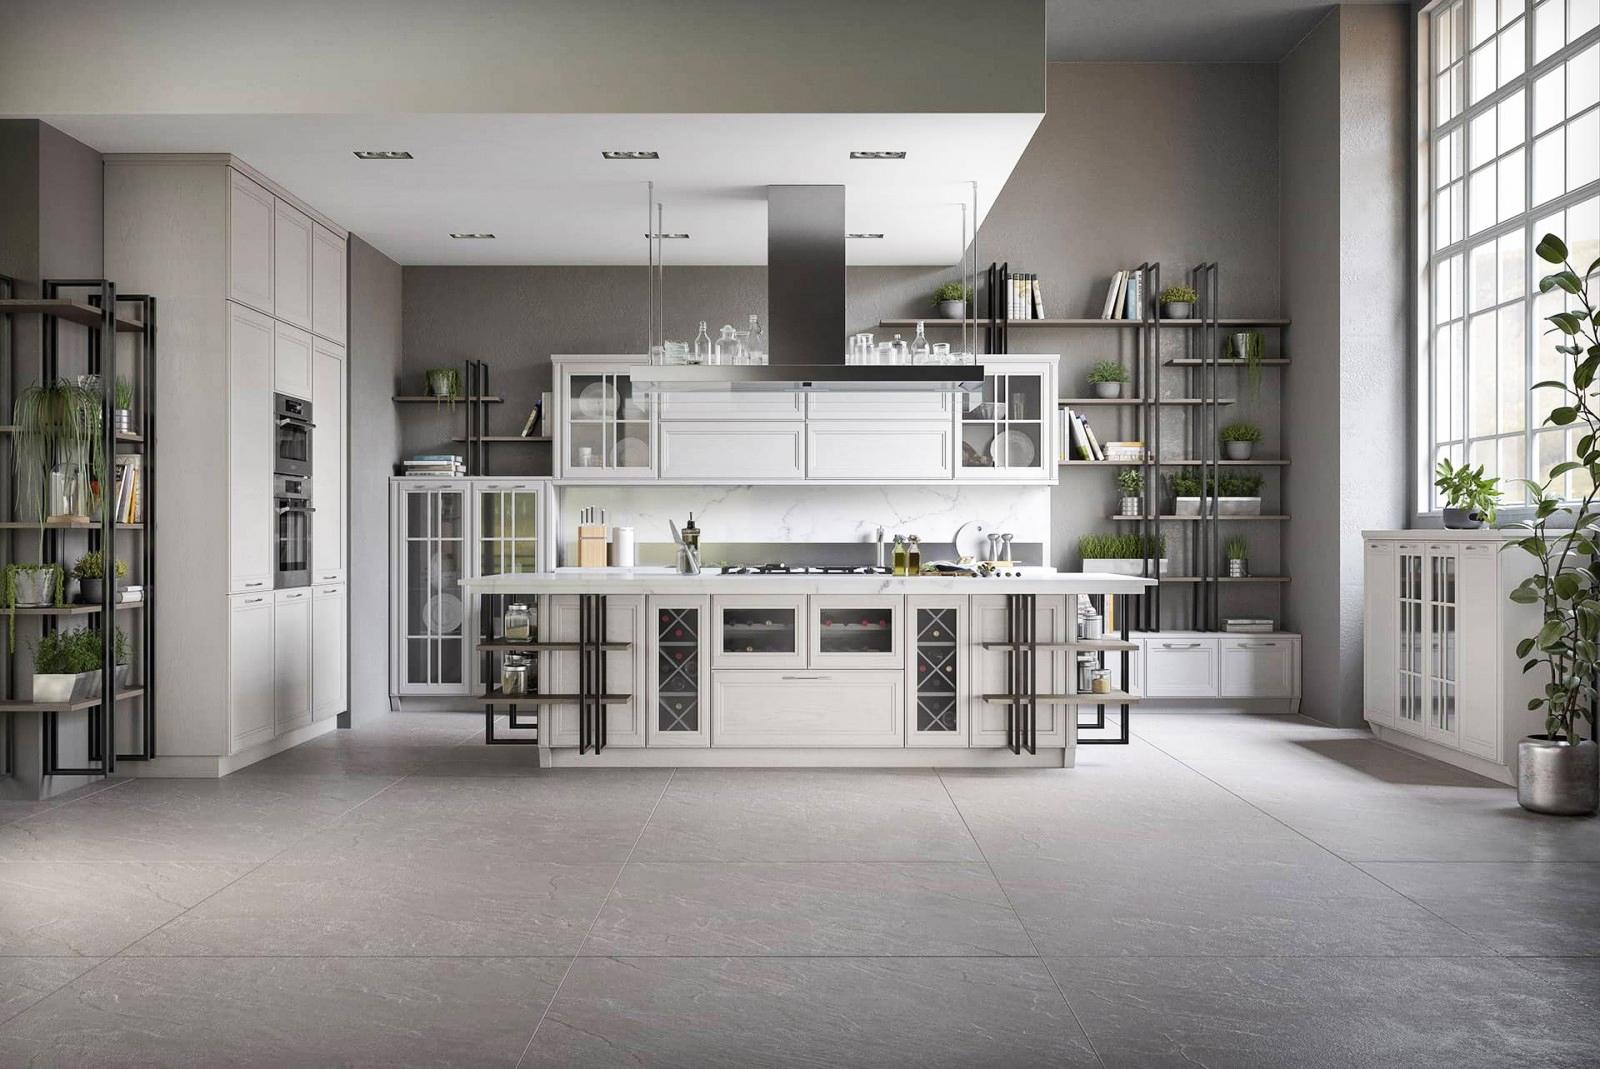 Full Size of Hängeregal Kücheninsel Moderne Loft Kche Freda Massivholz Luxus Mit Insel Küche Wohnzimmer Hängeregal Kücheninsel